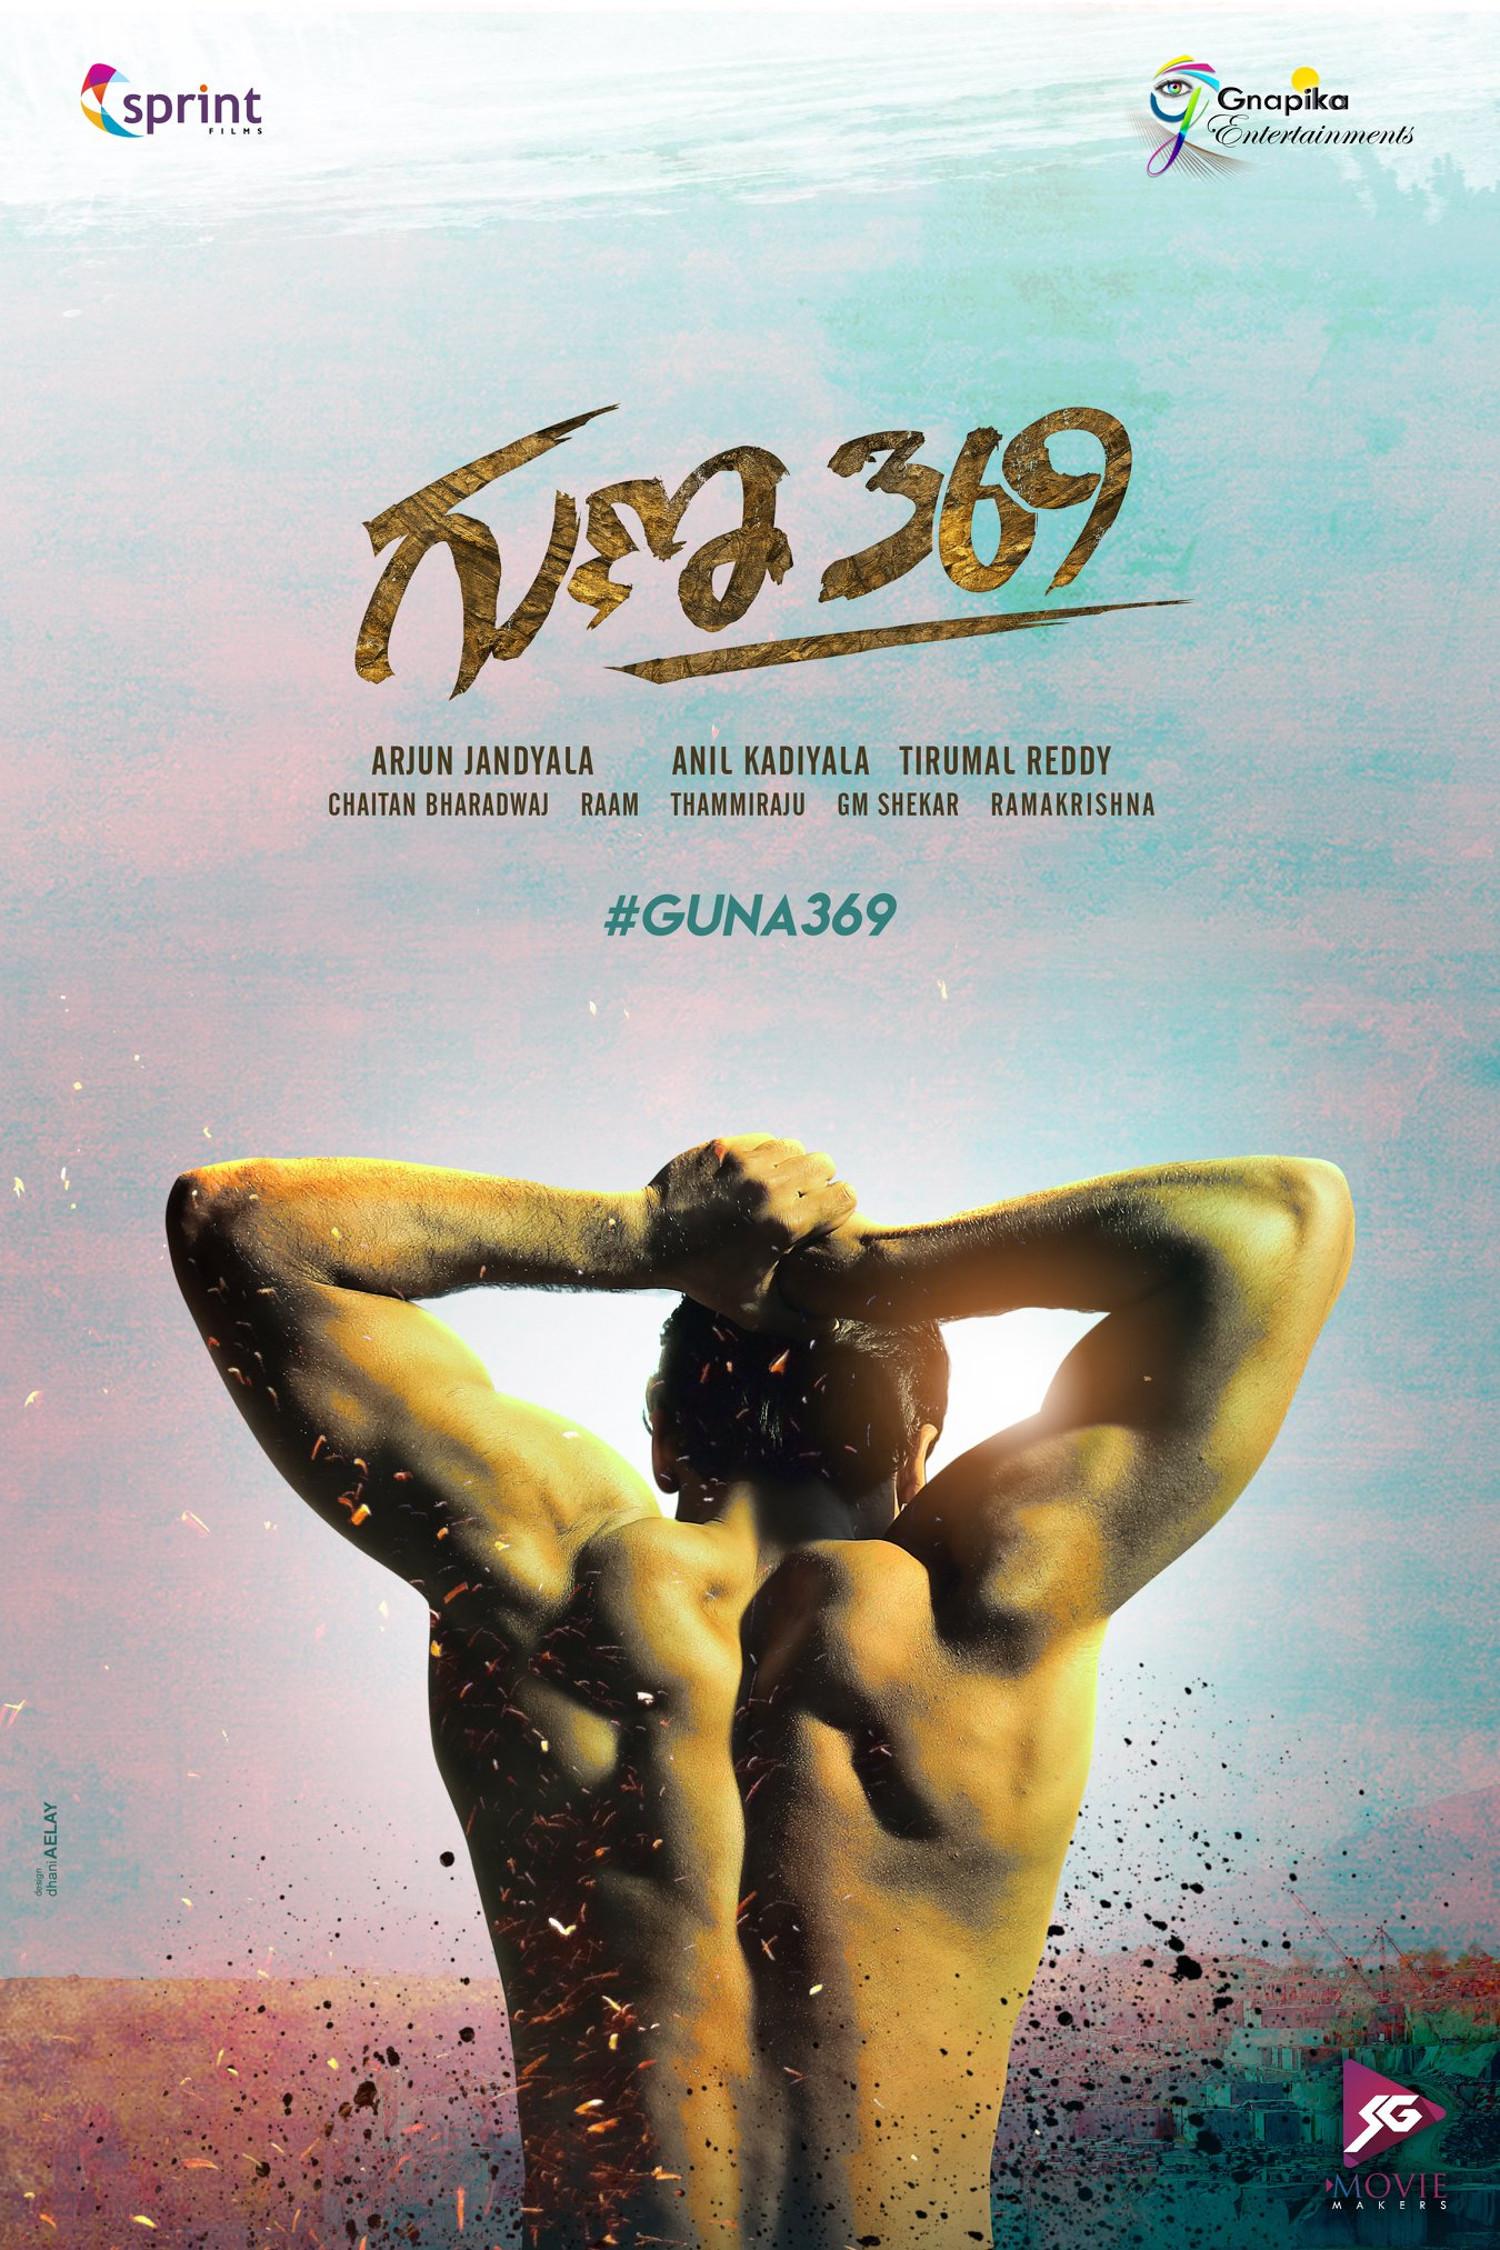 Actor Kartikeya Gummakonda Guna 369 movie first look poster HD